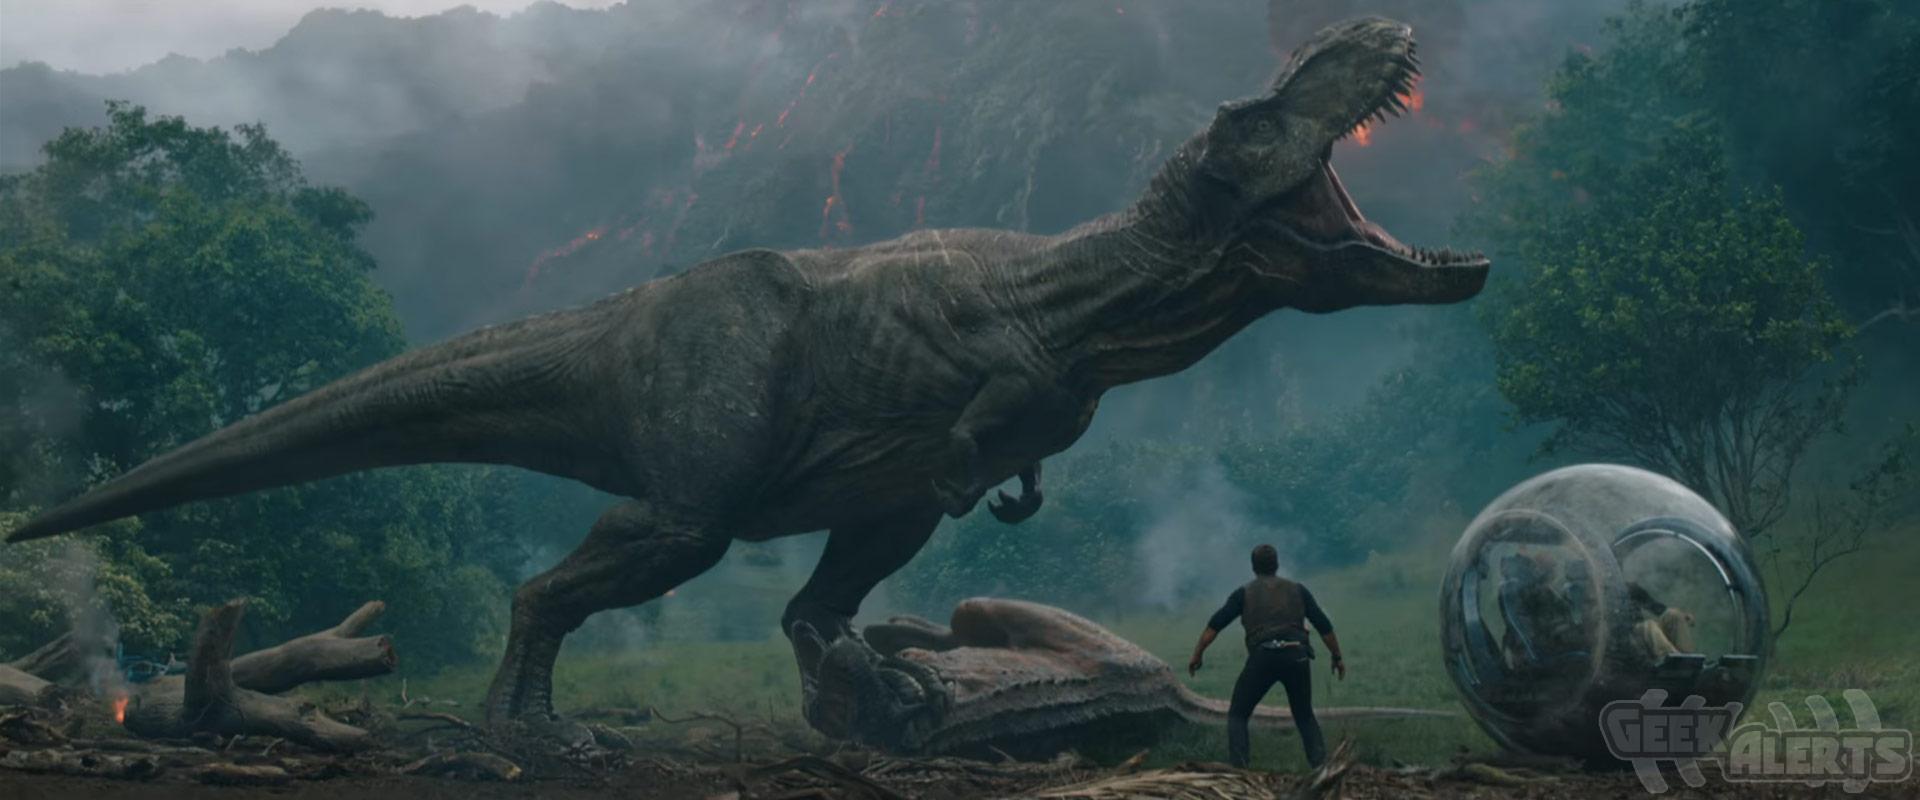 Jurassic World: Fallen Kingdom Trailer #2